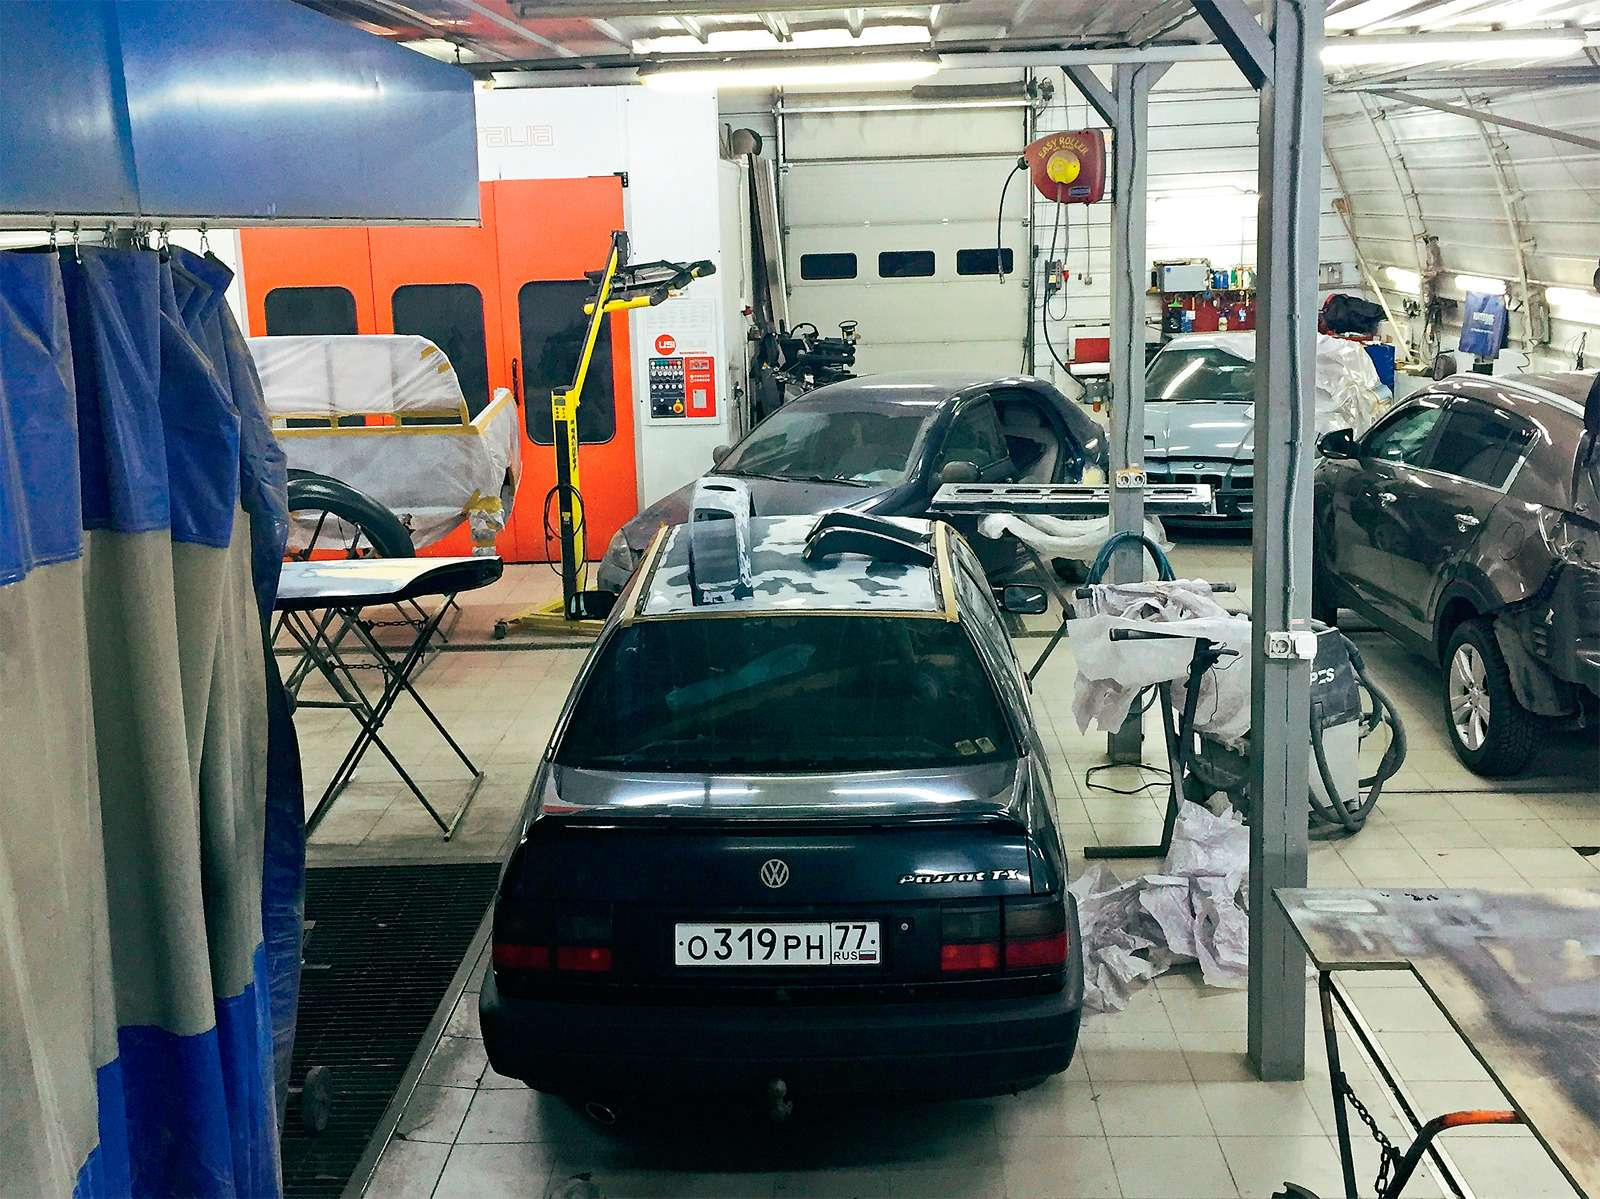 схема сто техстанции по ремонту авто